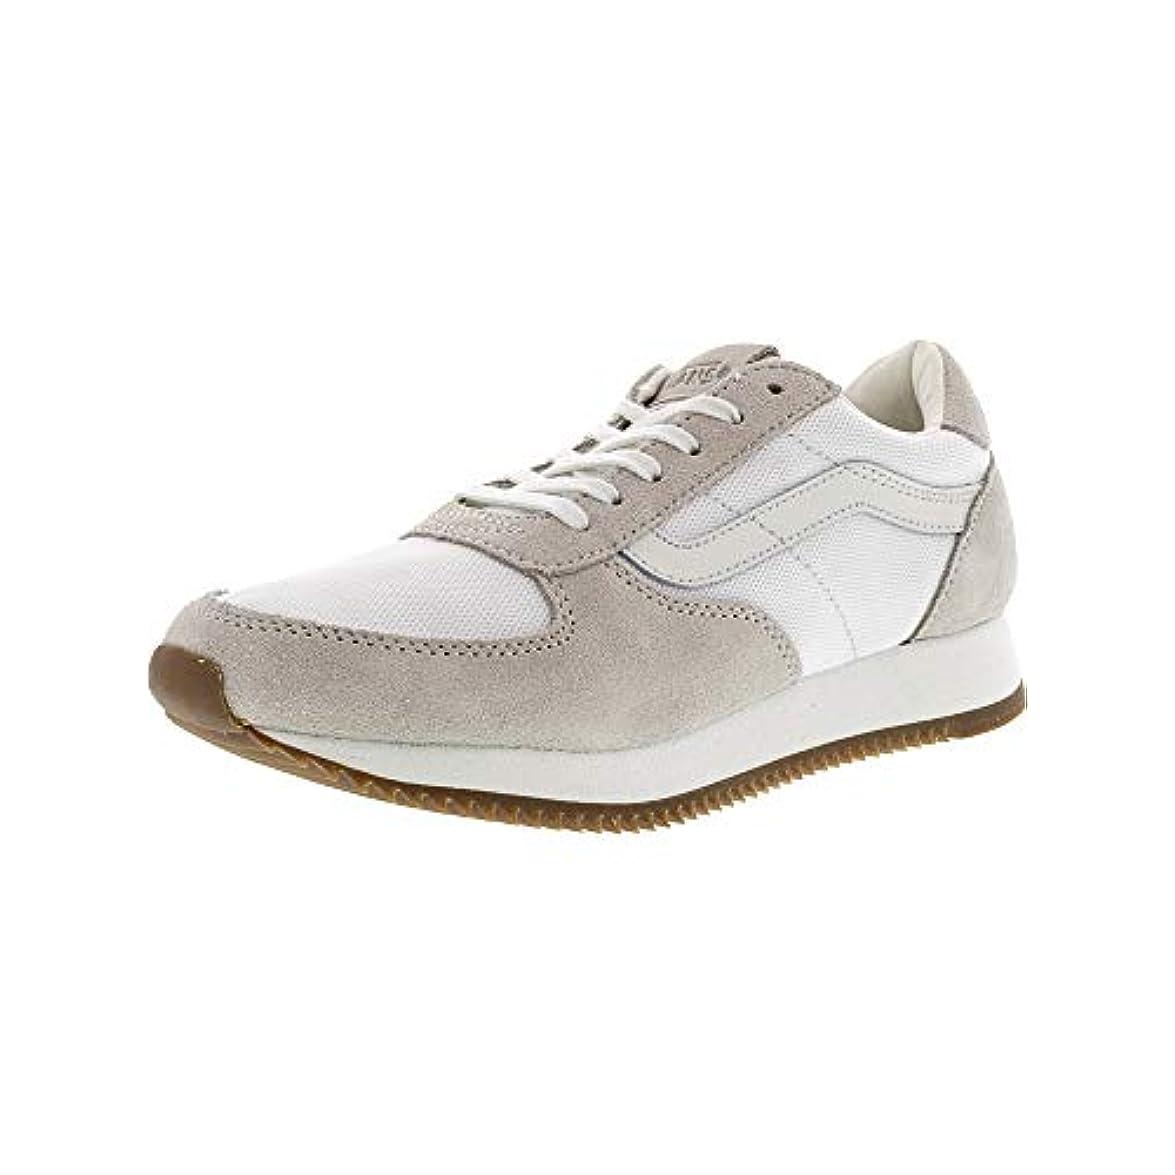 Vans Runner Ankle-high Suede Running Shoe